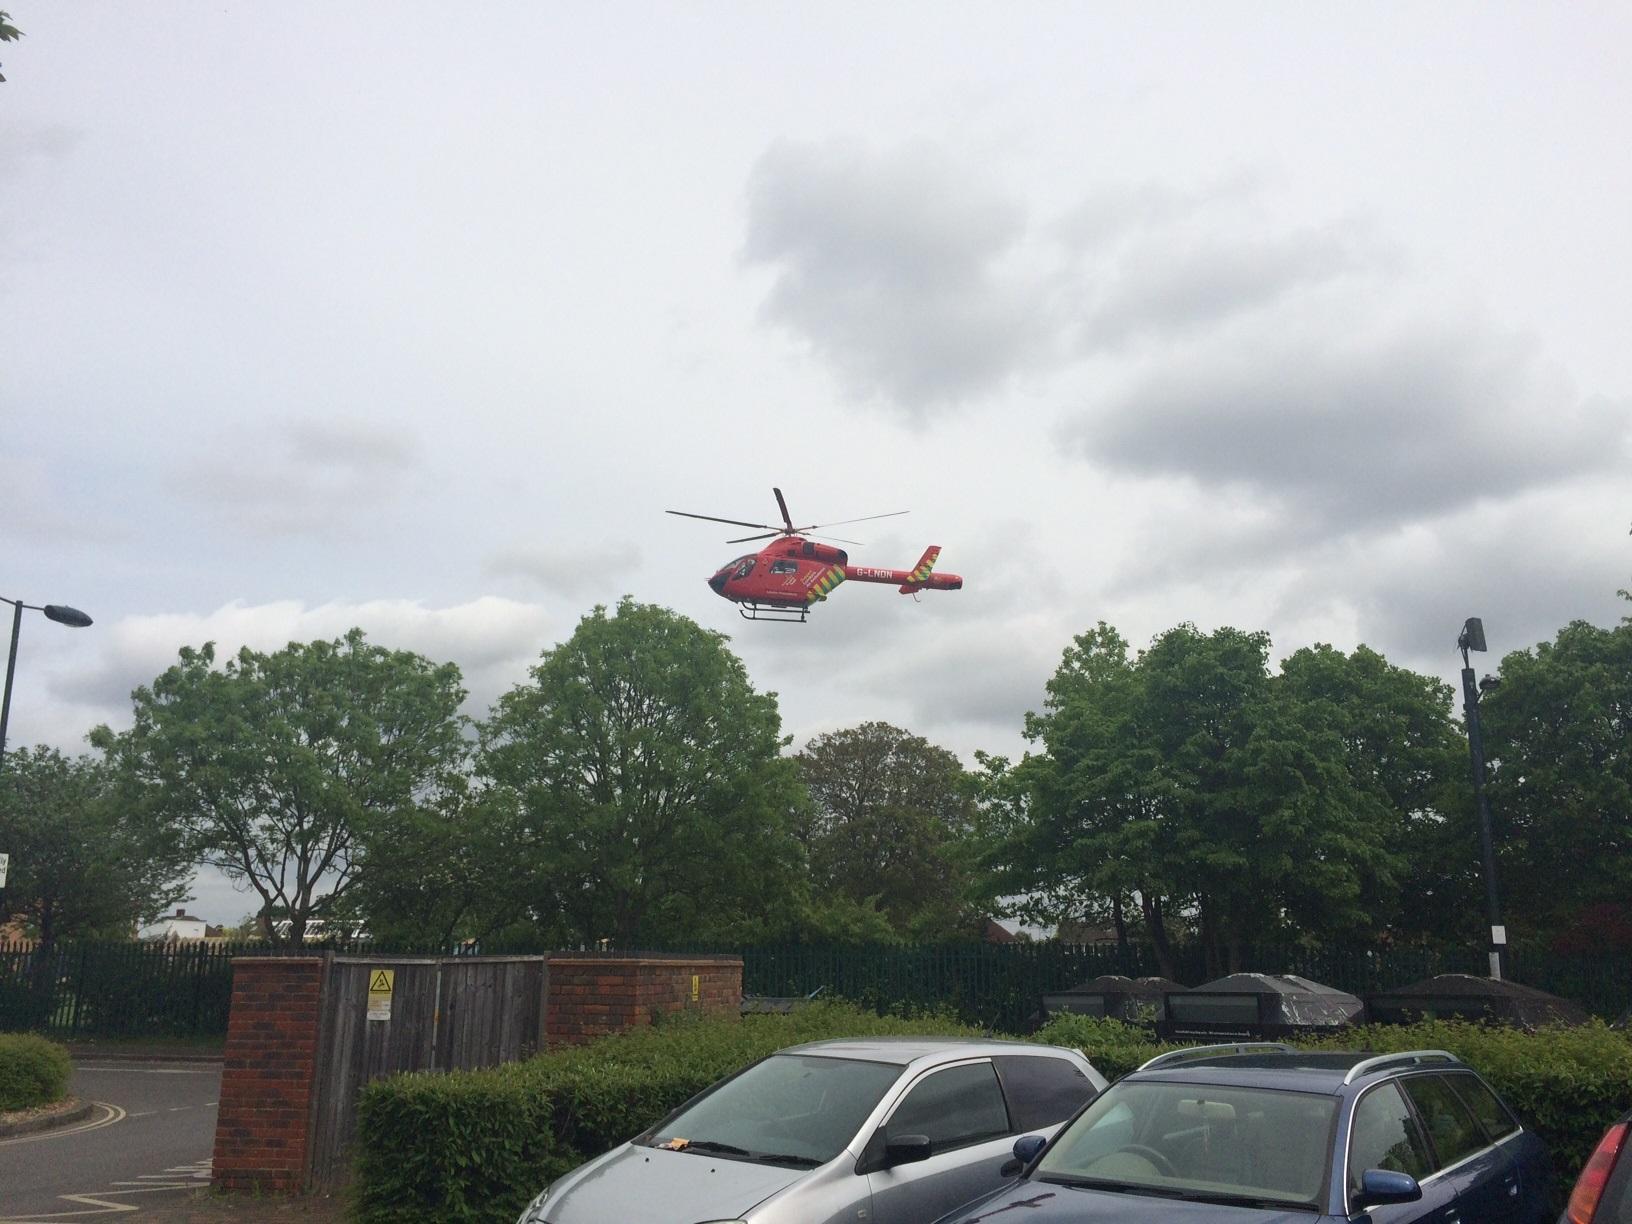 Hampton stabbing: Four women attacked near Sainsbury's vehicle park